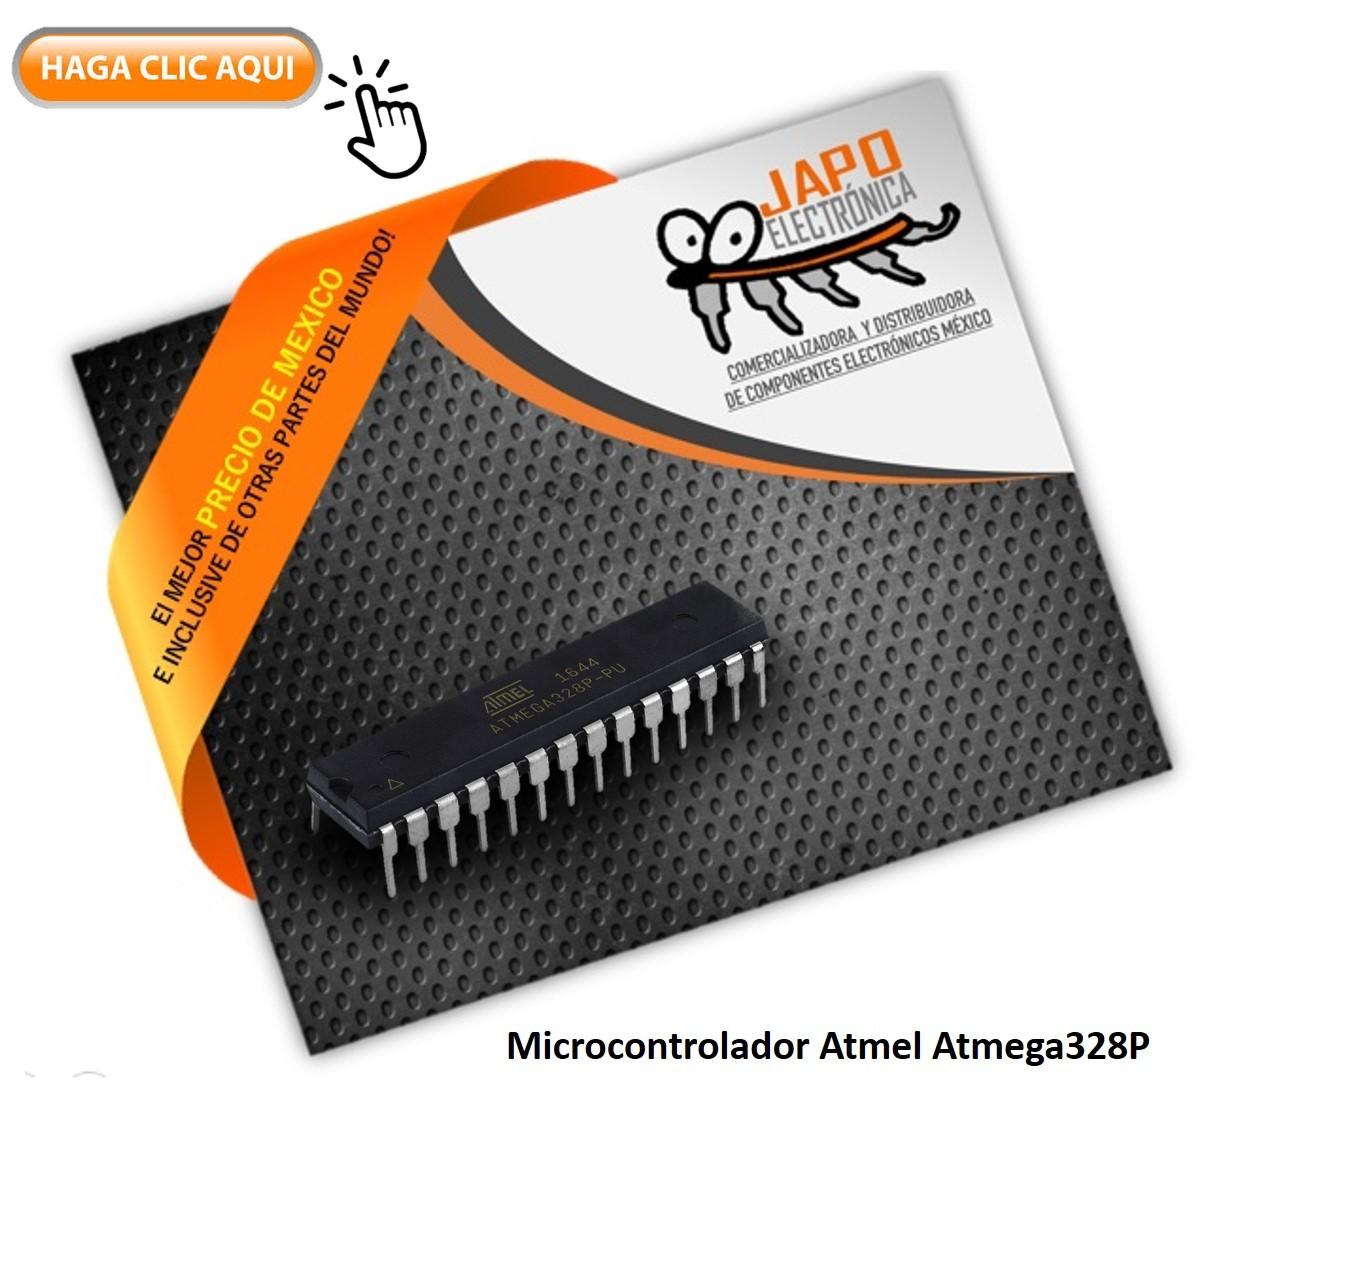 Microcontrolador Atmel Atmega328P